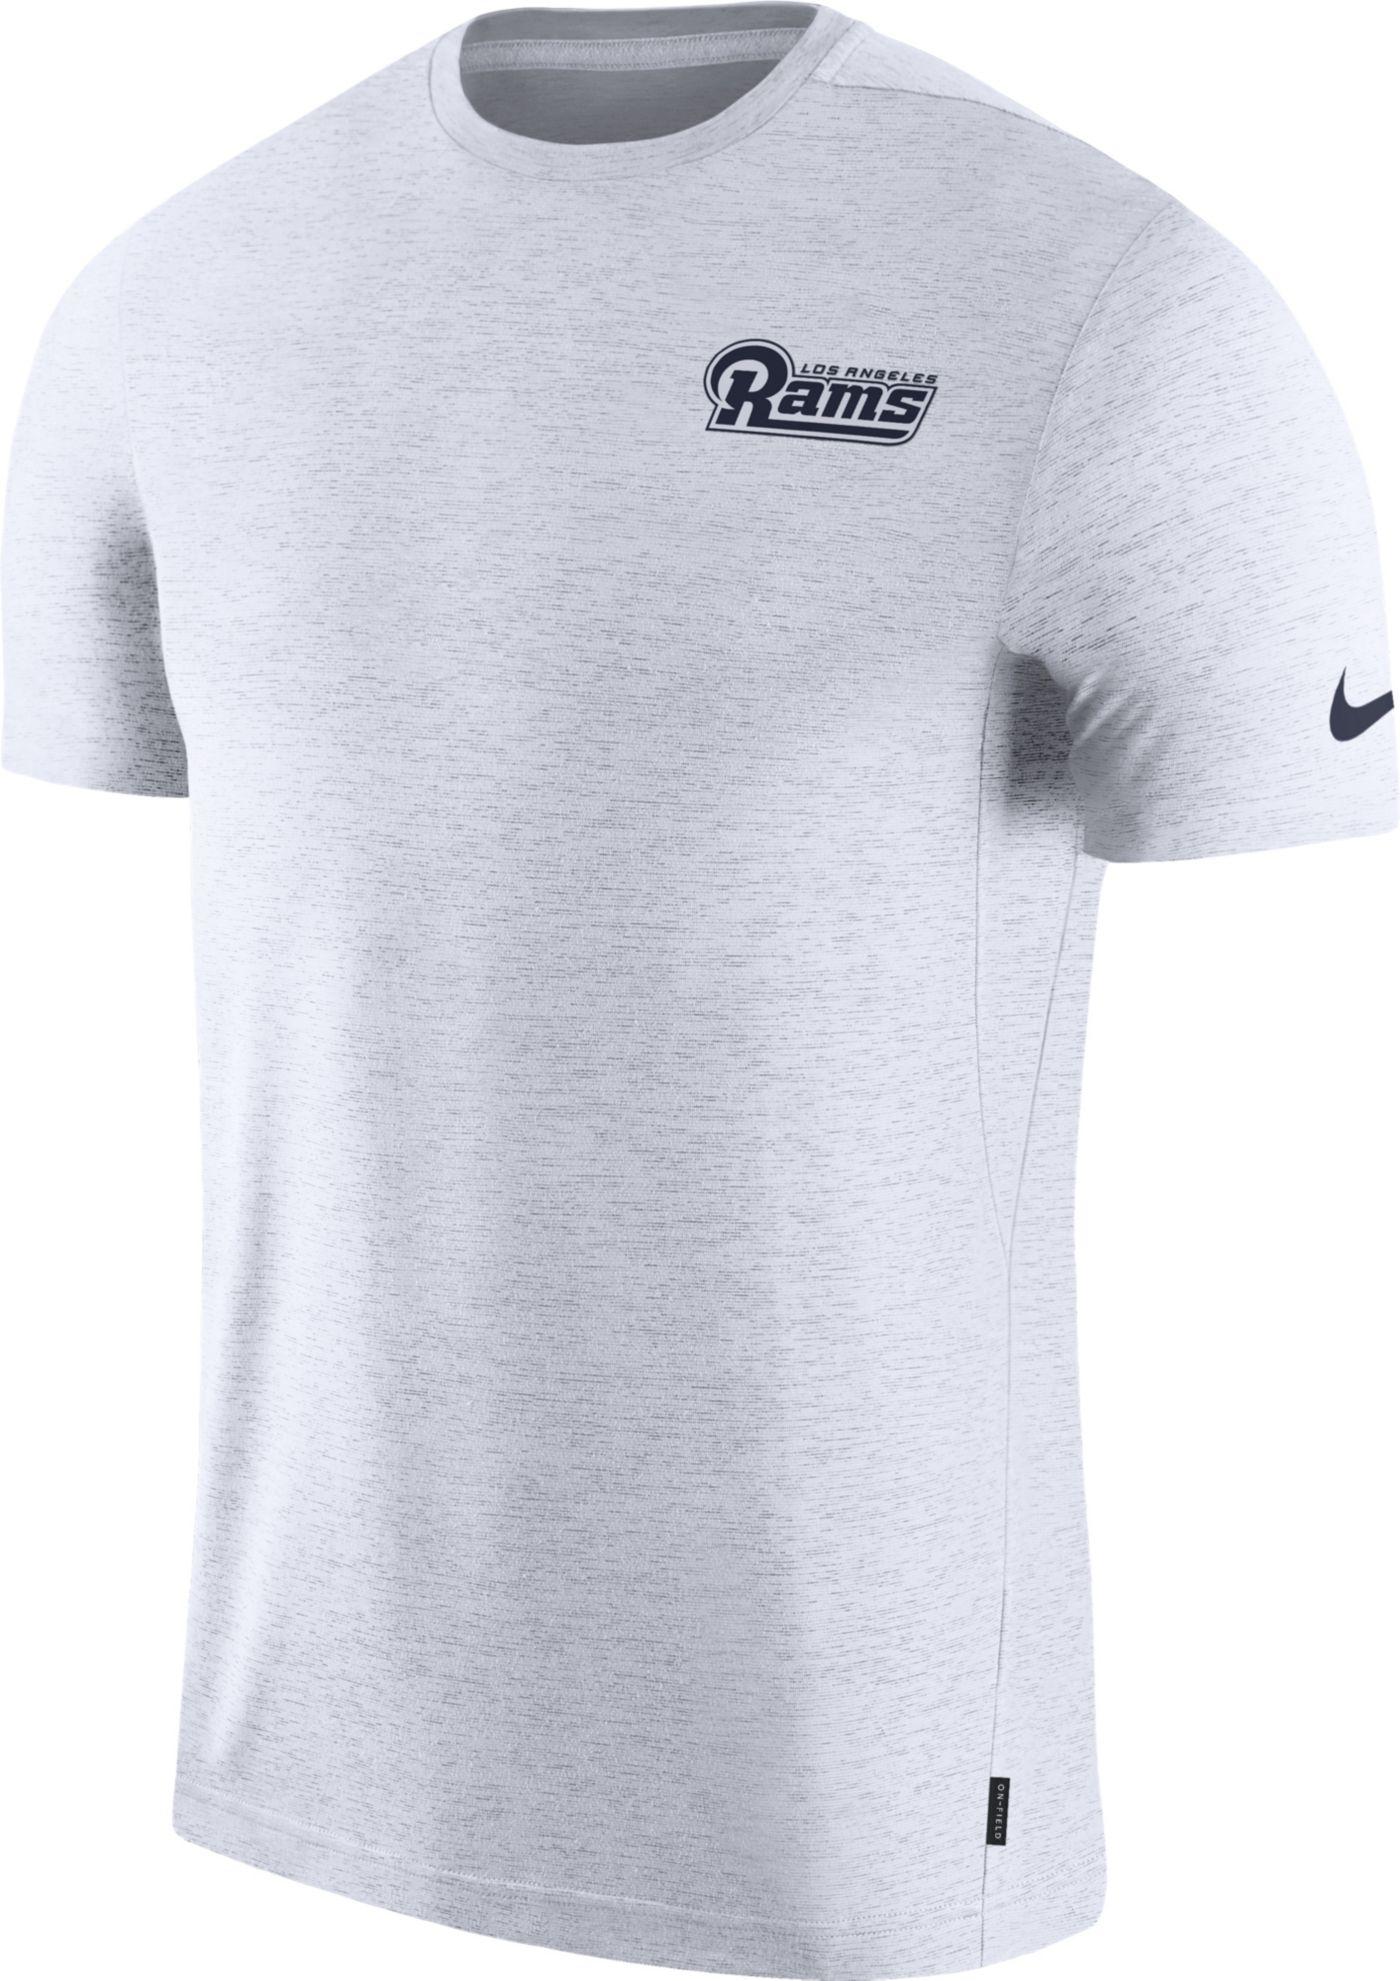 Nike Men's Los Angeles Rams Sideline Coach Performance White T-Shirt